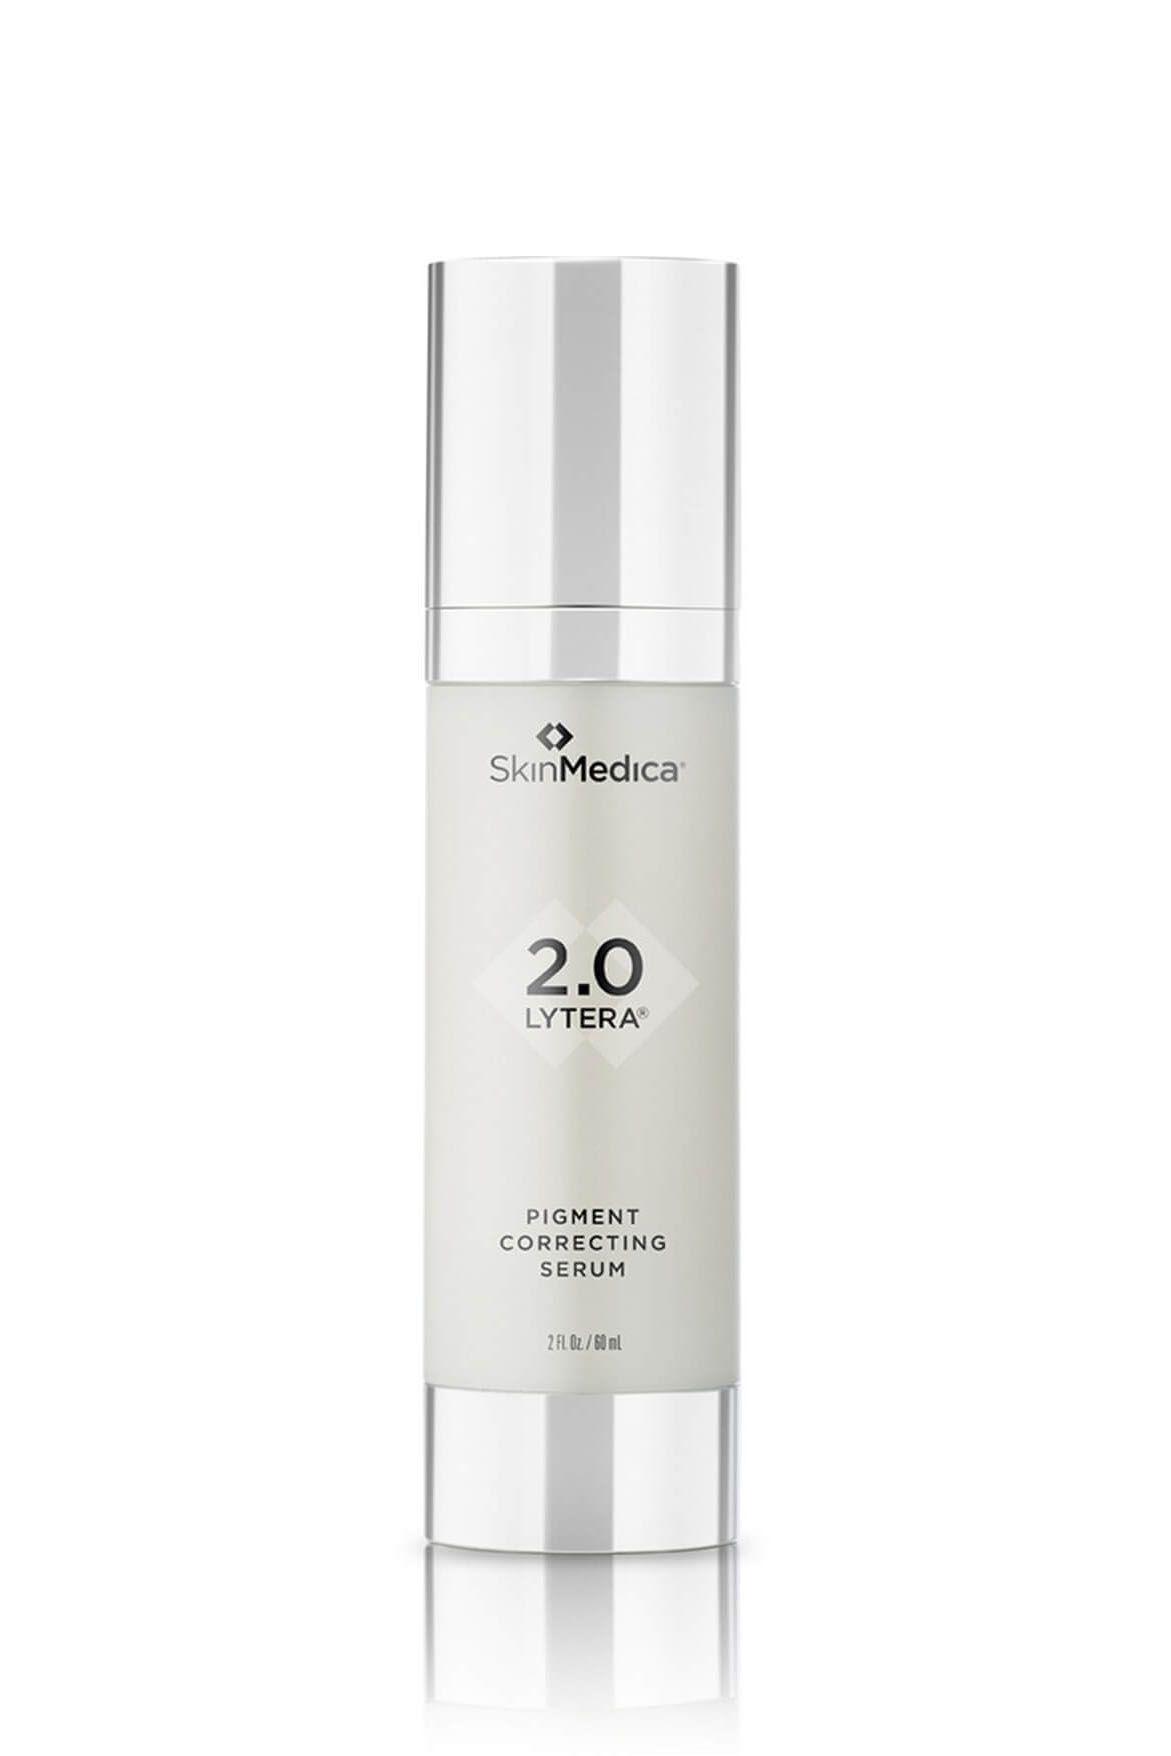 Skinmedica Lytera 2 0 Pigment Correcting Serum